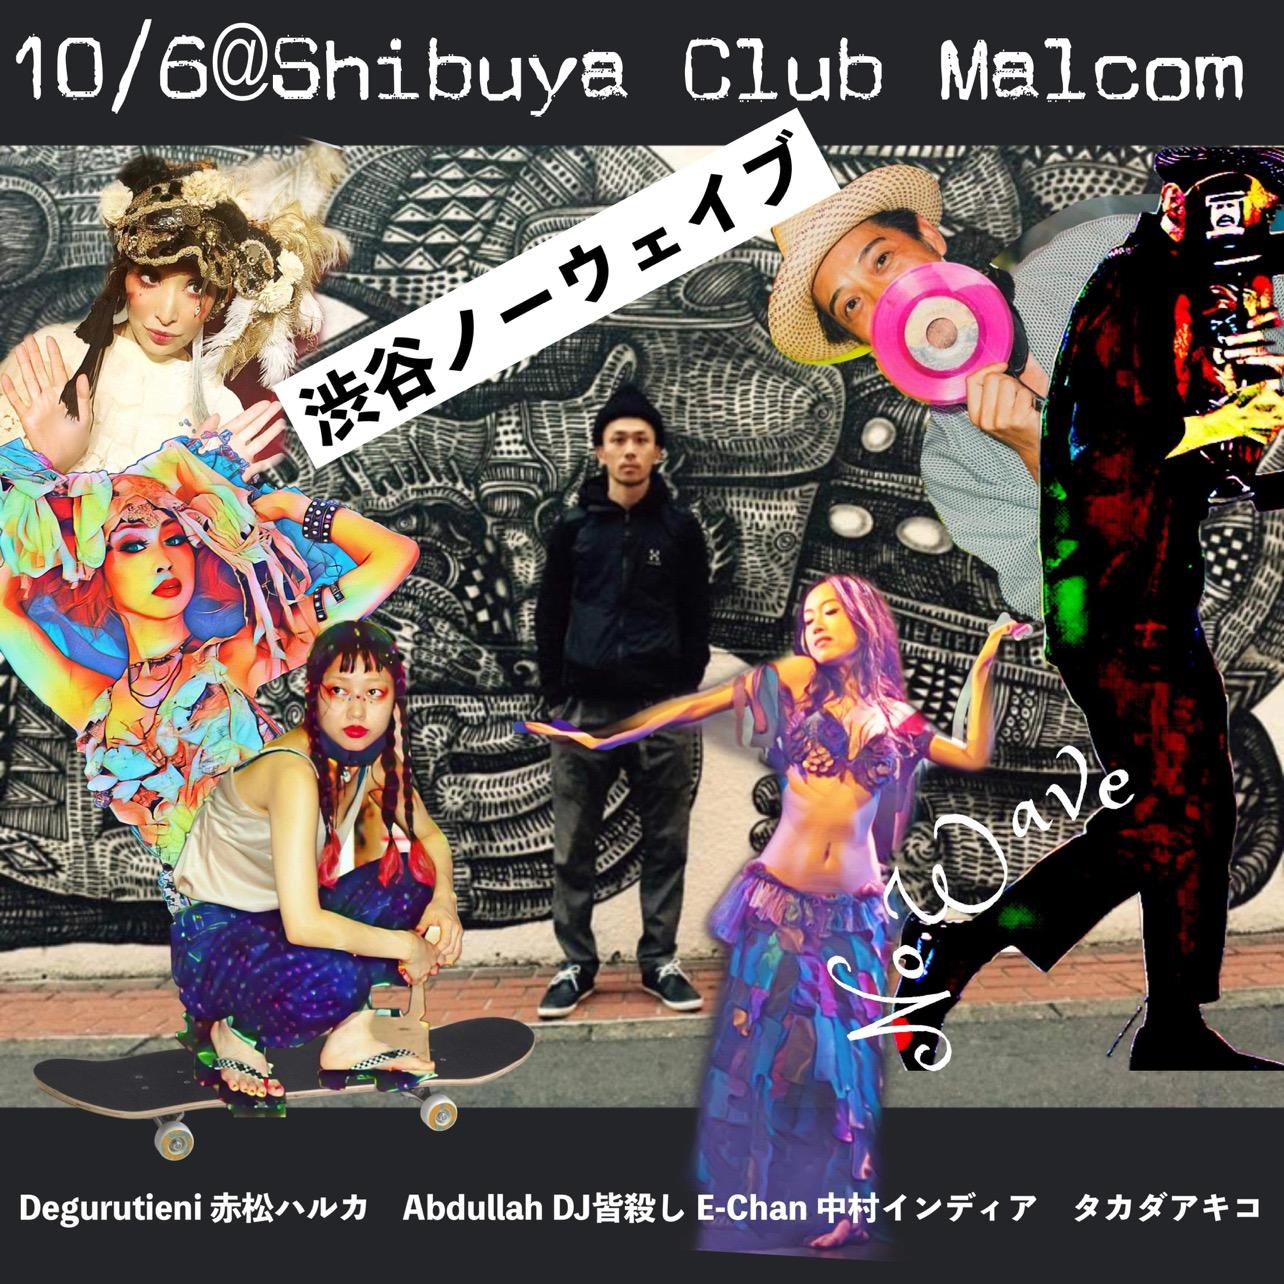 10/6(WED)渋谷 No Wave